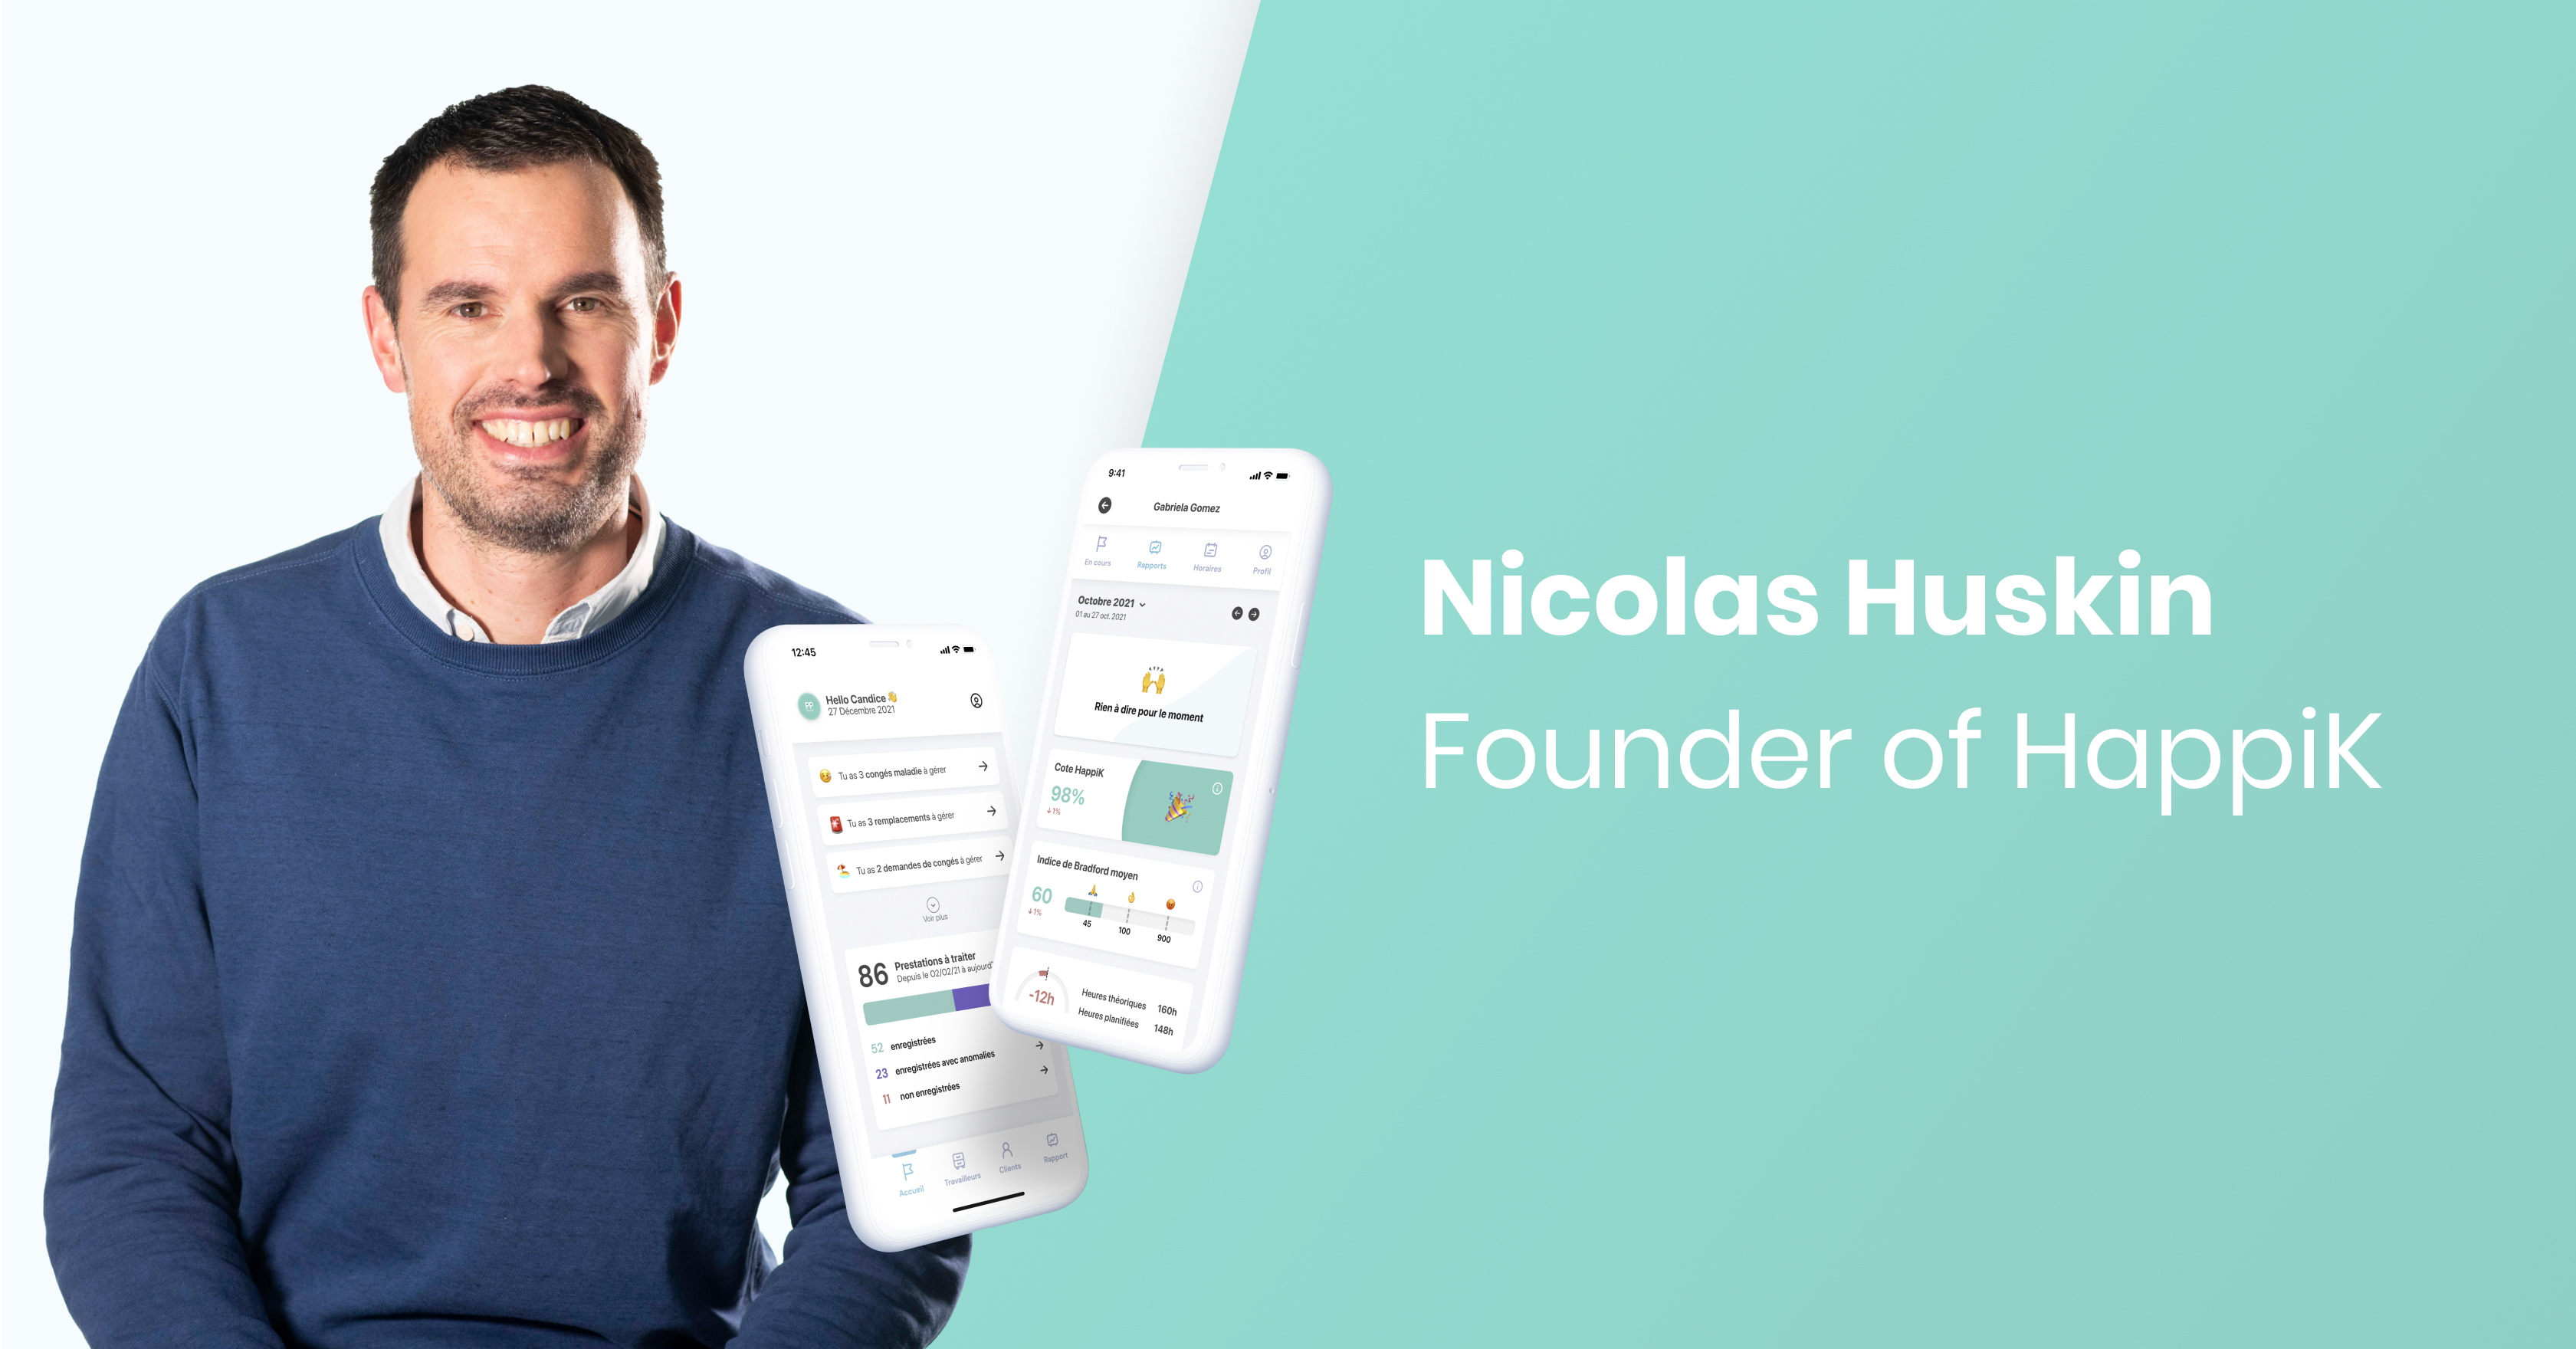 Nightborn - Interview with Nicolas Huskin, founder of HappiK